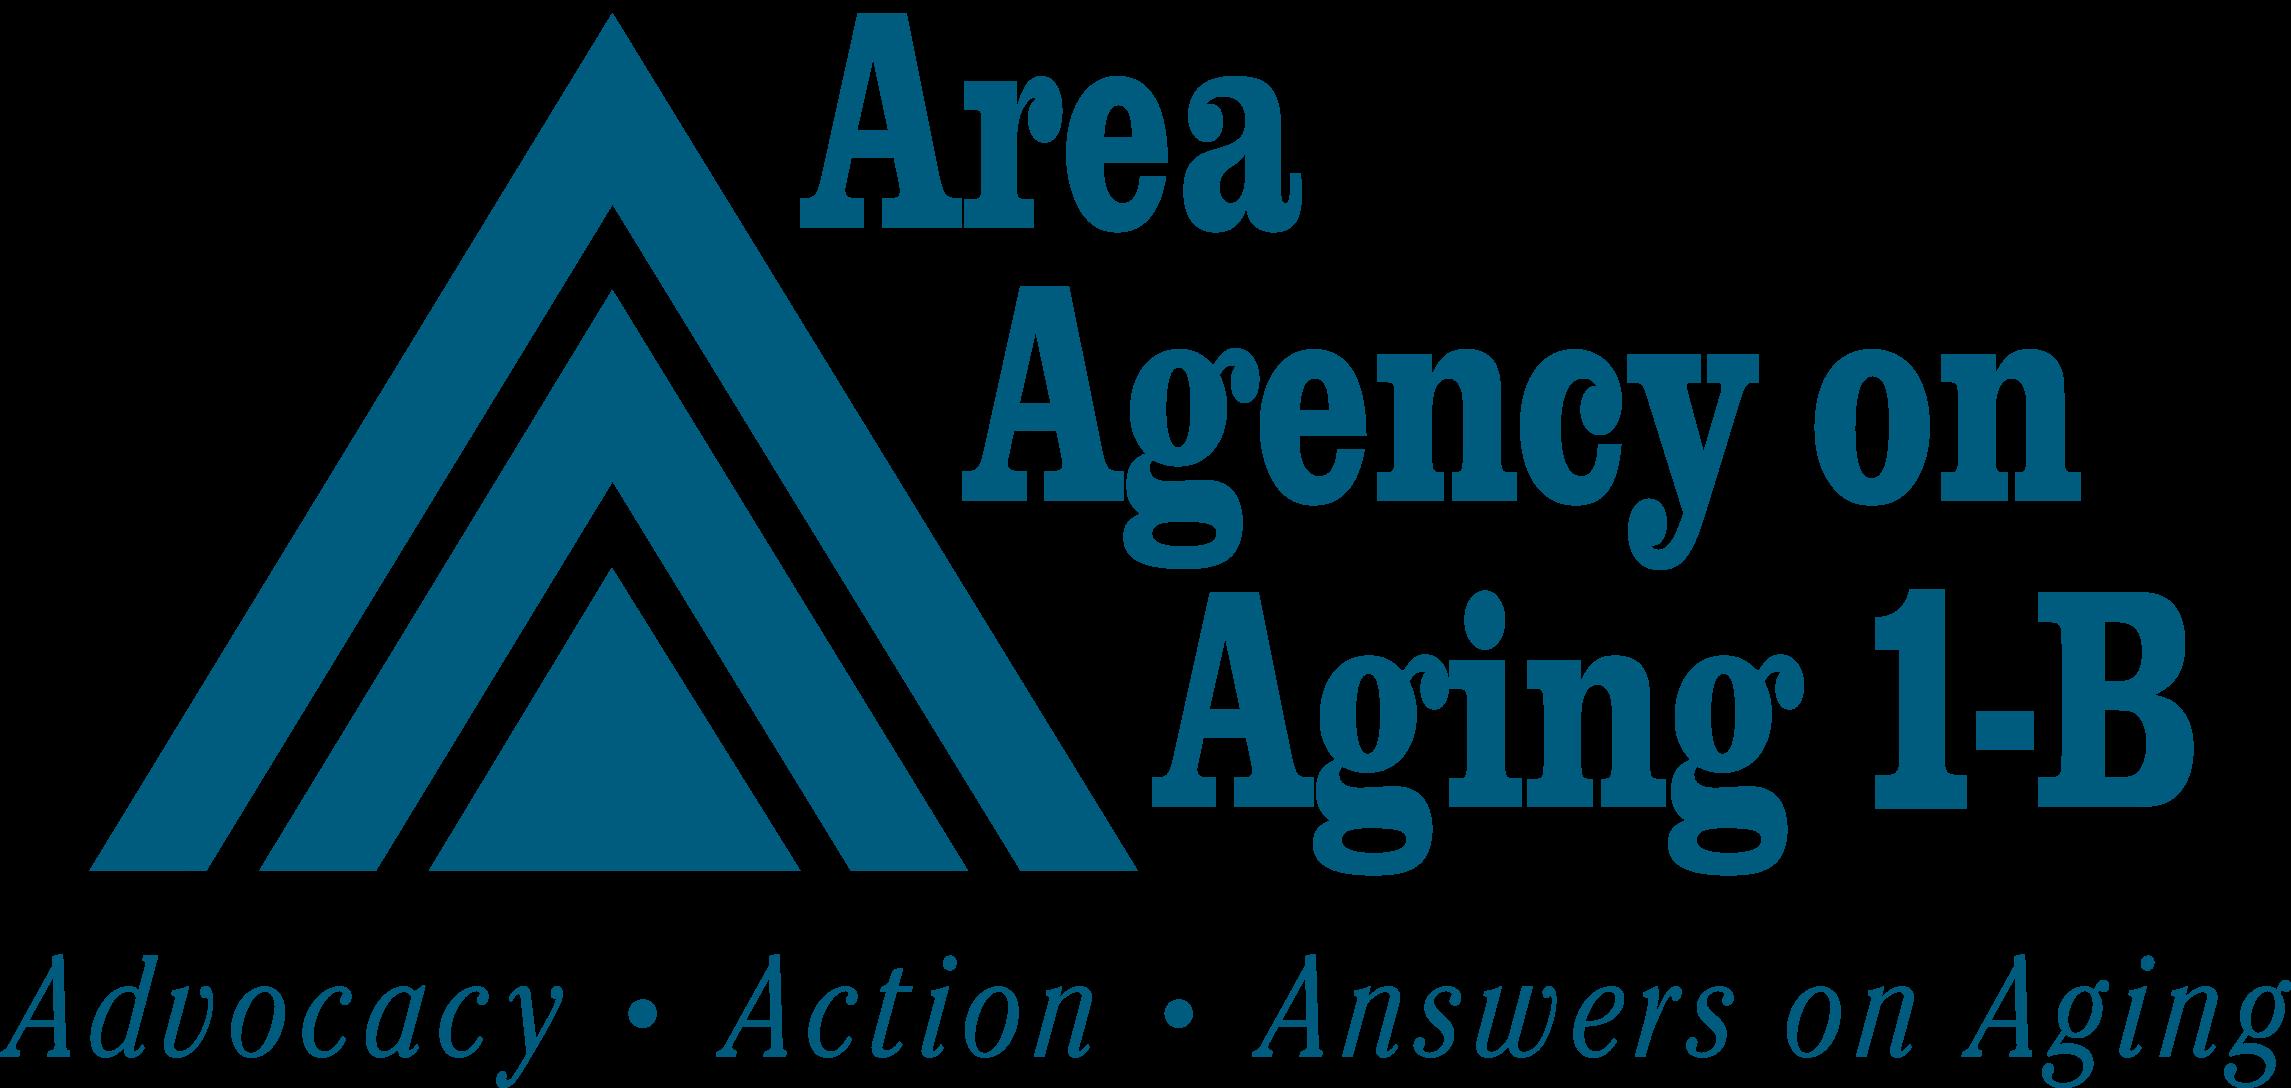 Area Agency on Aging 1-B Board of Directors | AAA1B